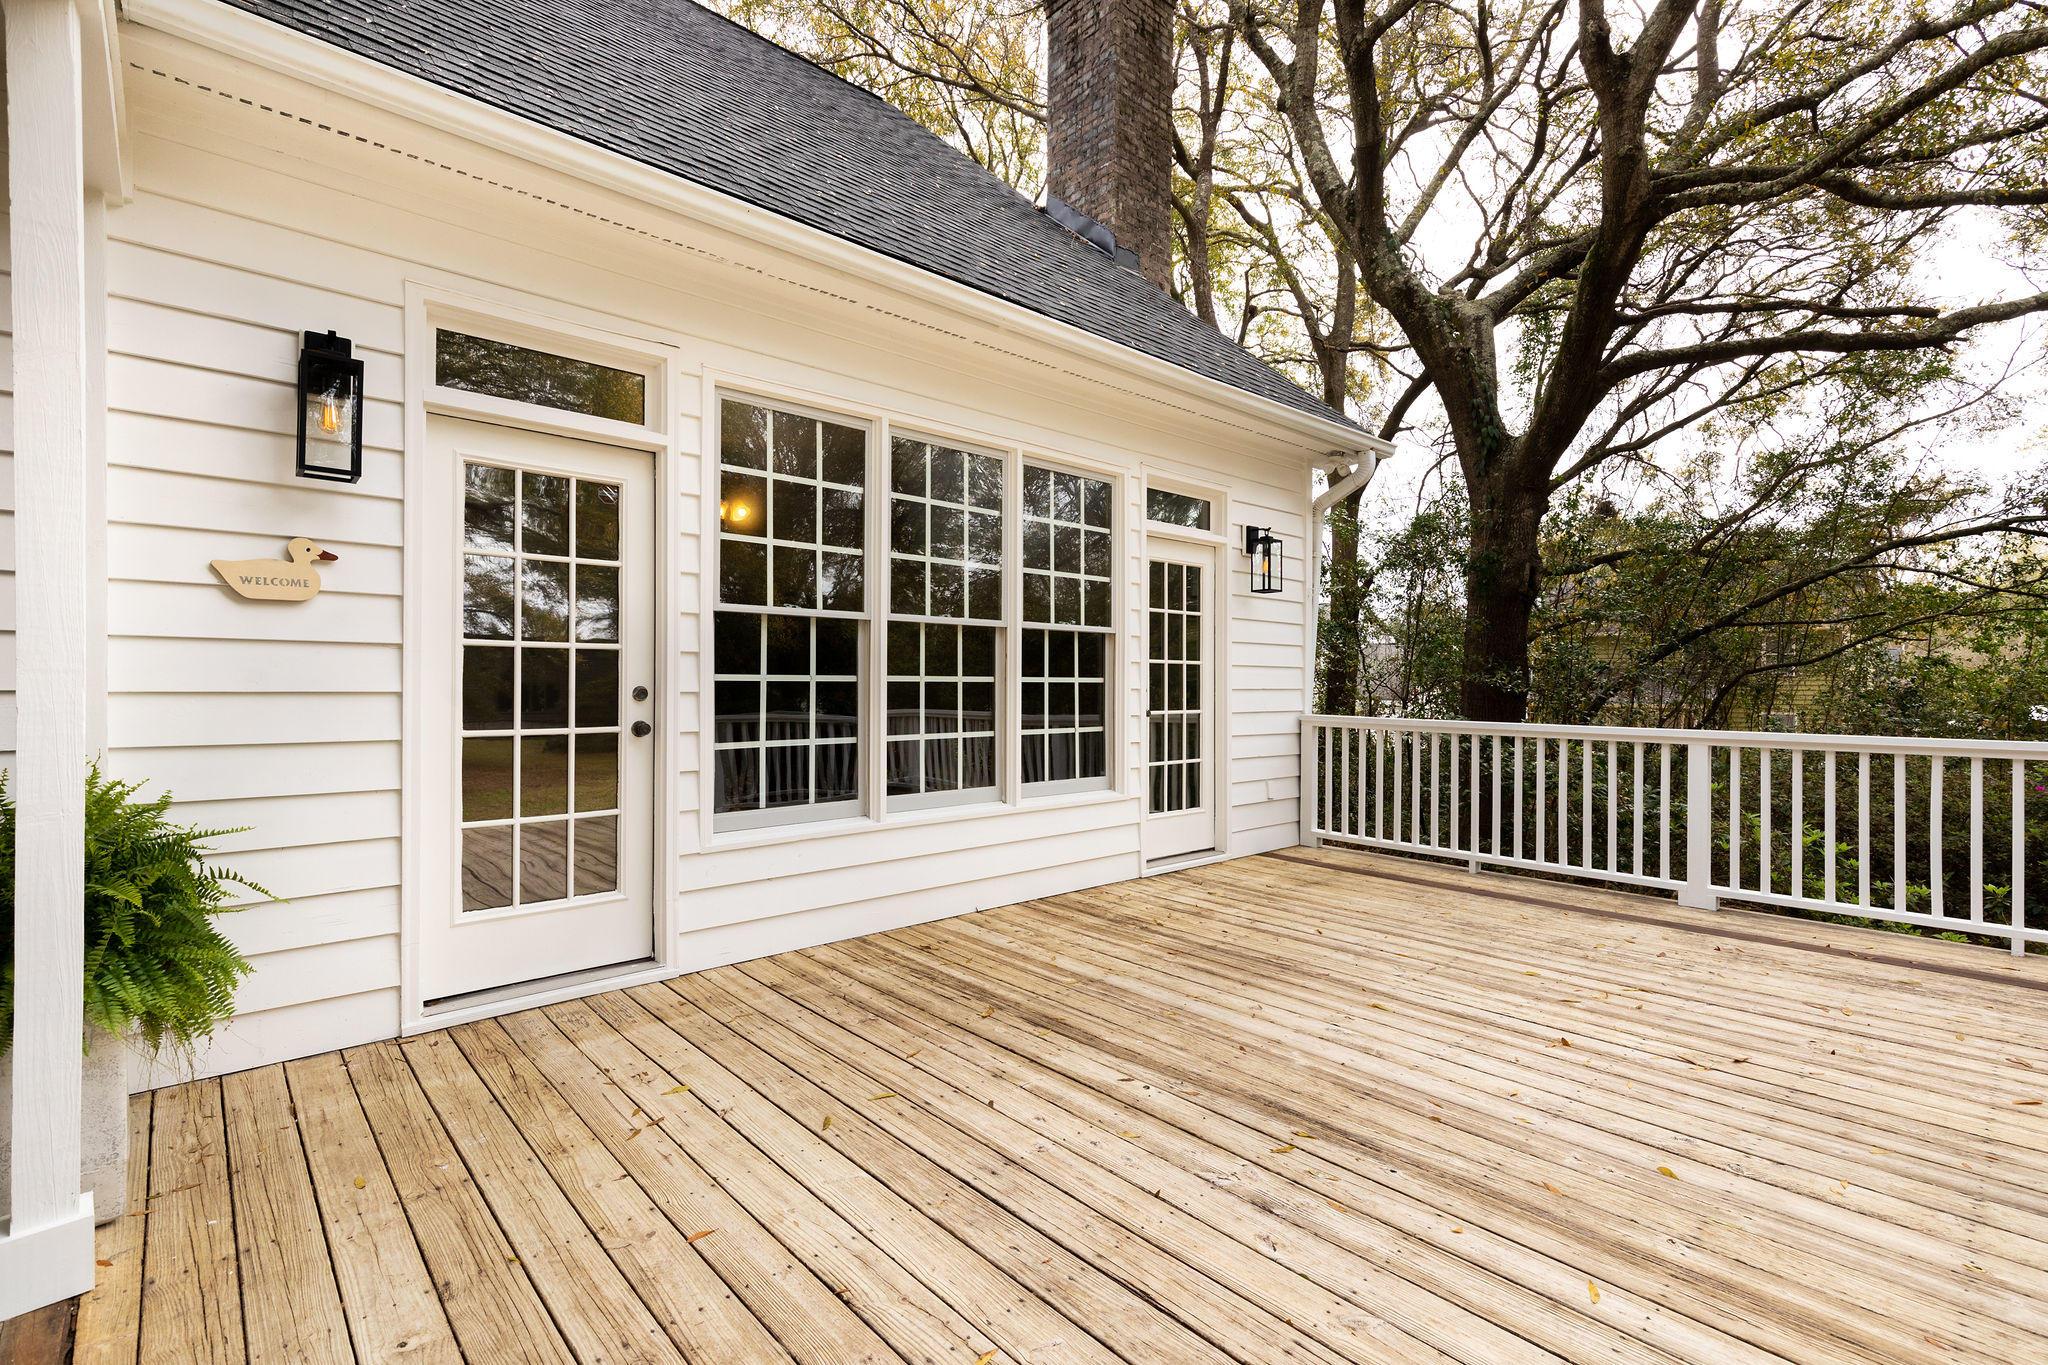 Old Mt Pleasant Homes For Sale - 1417 Edwards, Mount Pleasant, SC - 19